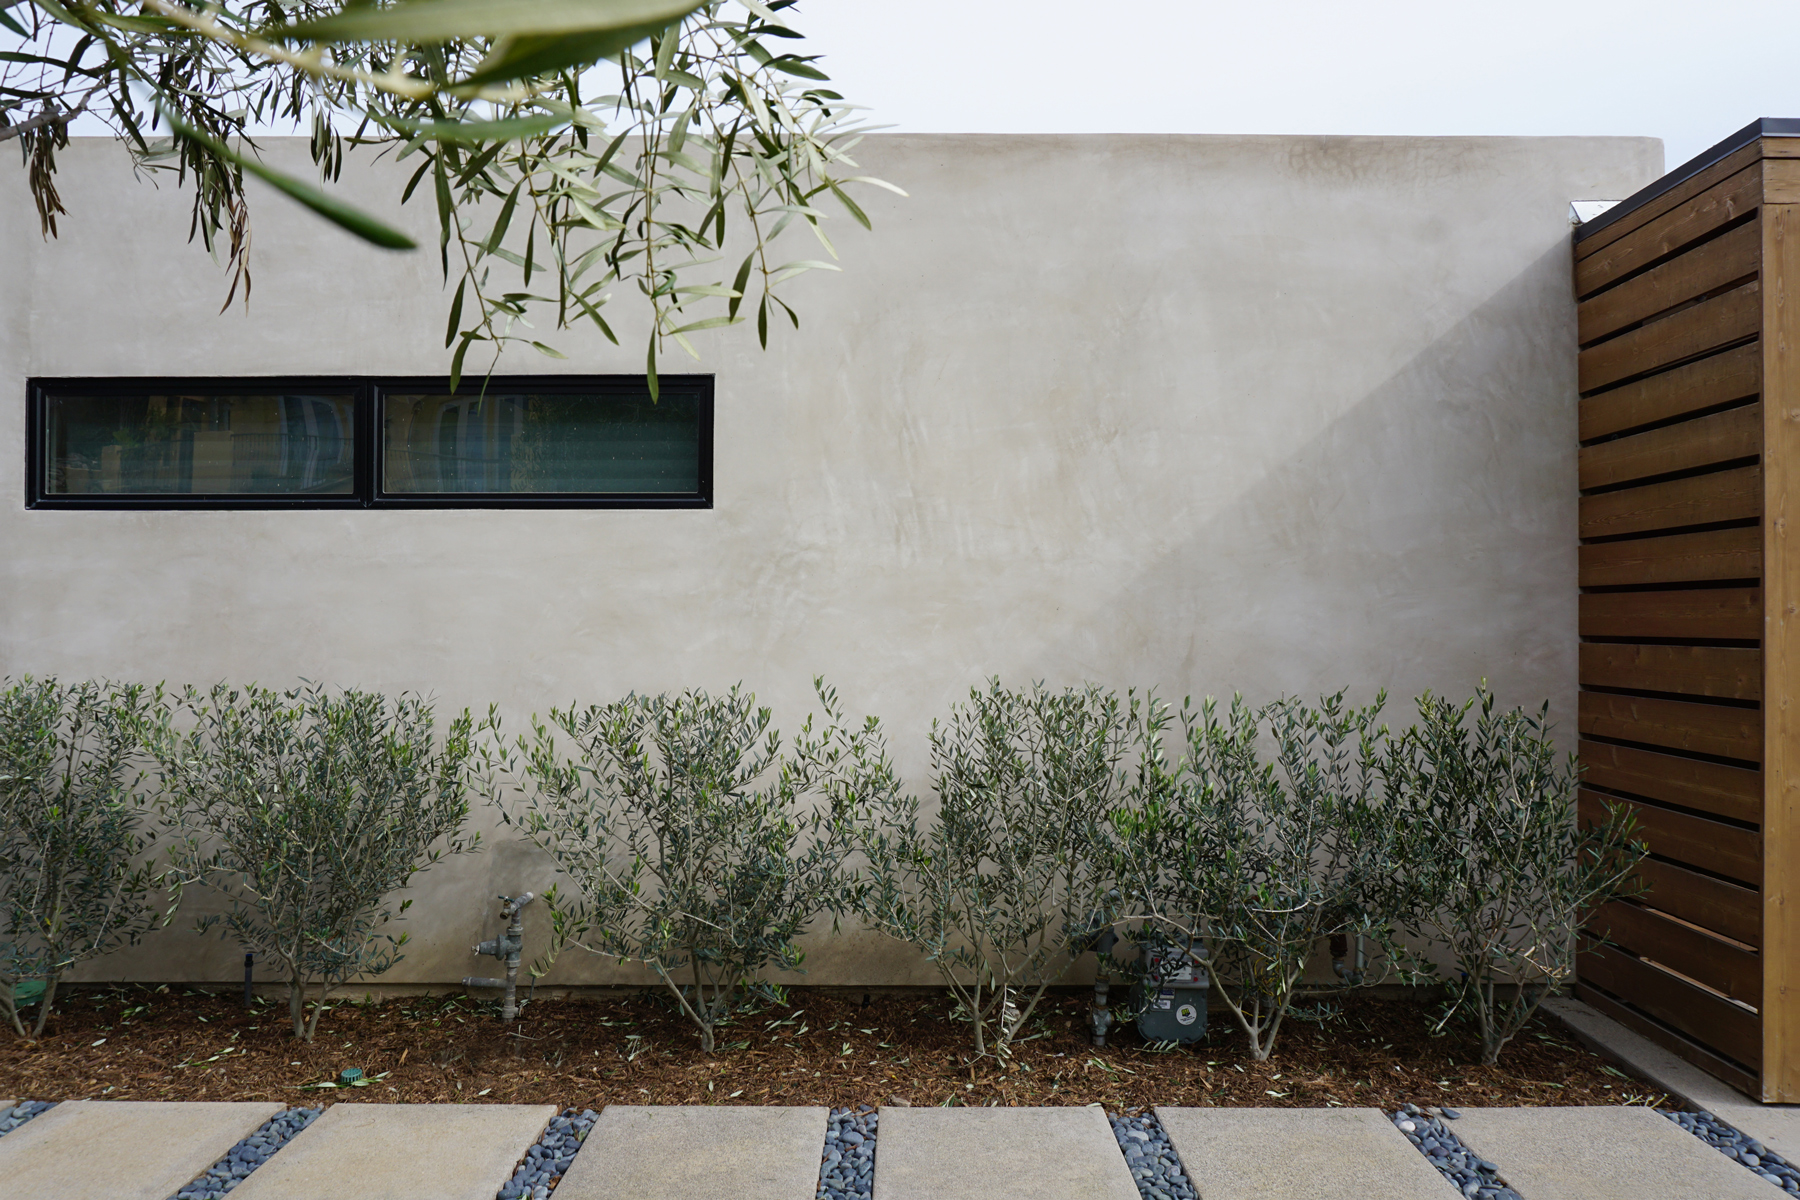 midcentury modern landscape at sideyard / laguna niguel, ca